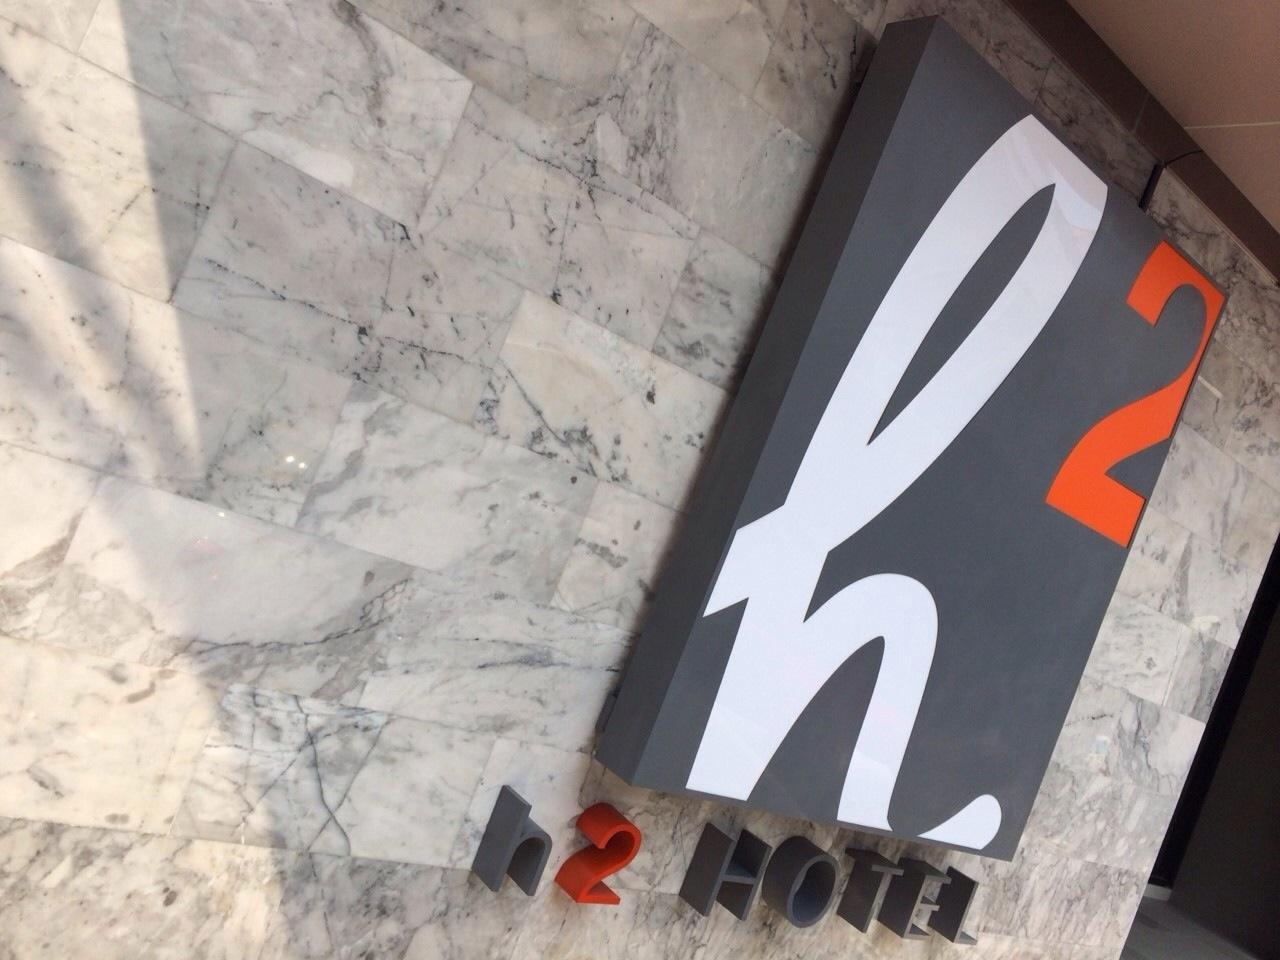 H2 Hotel โรงแรมเอช 2